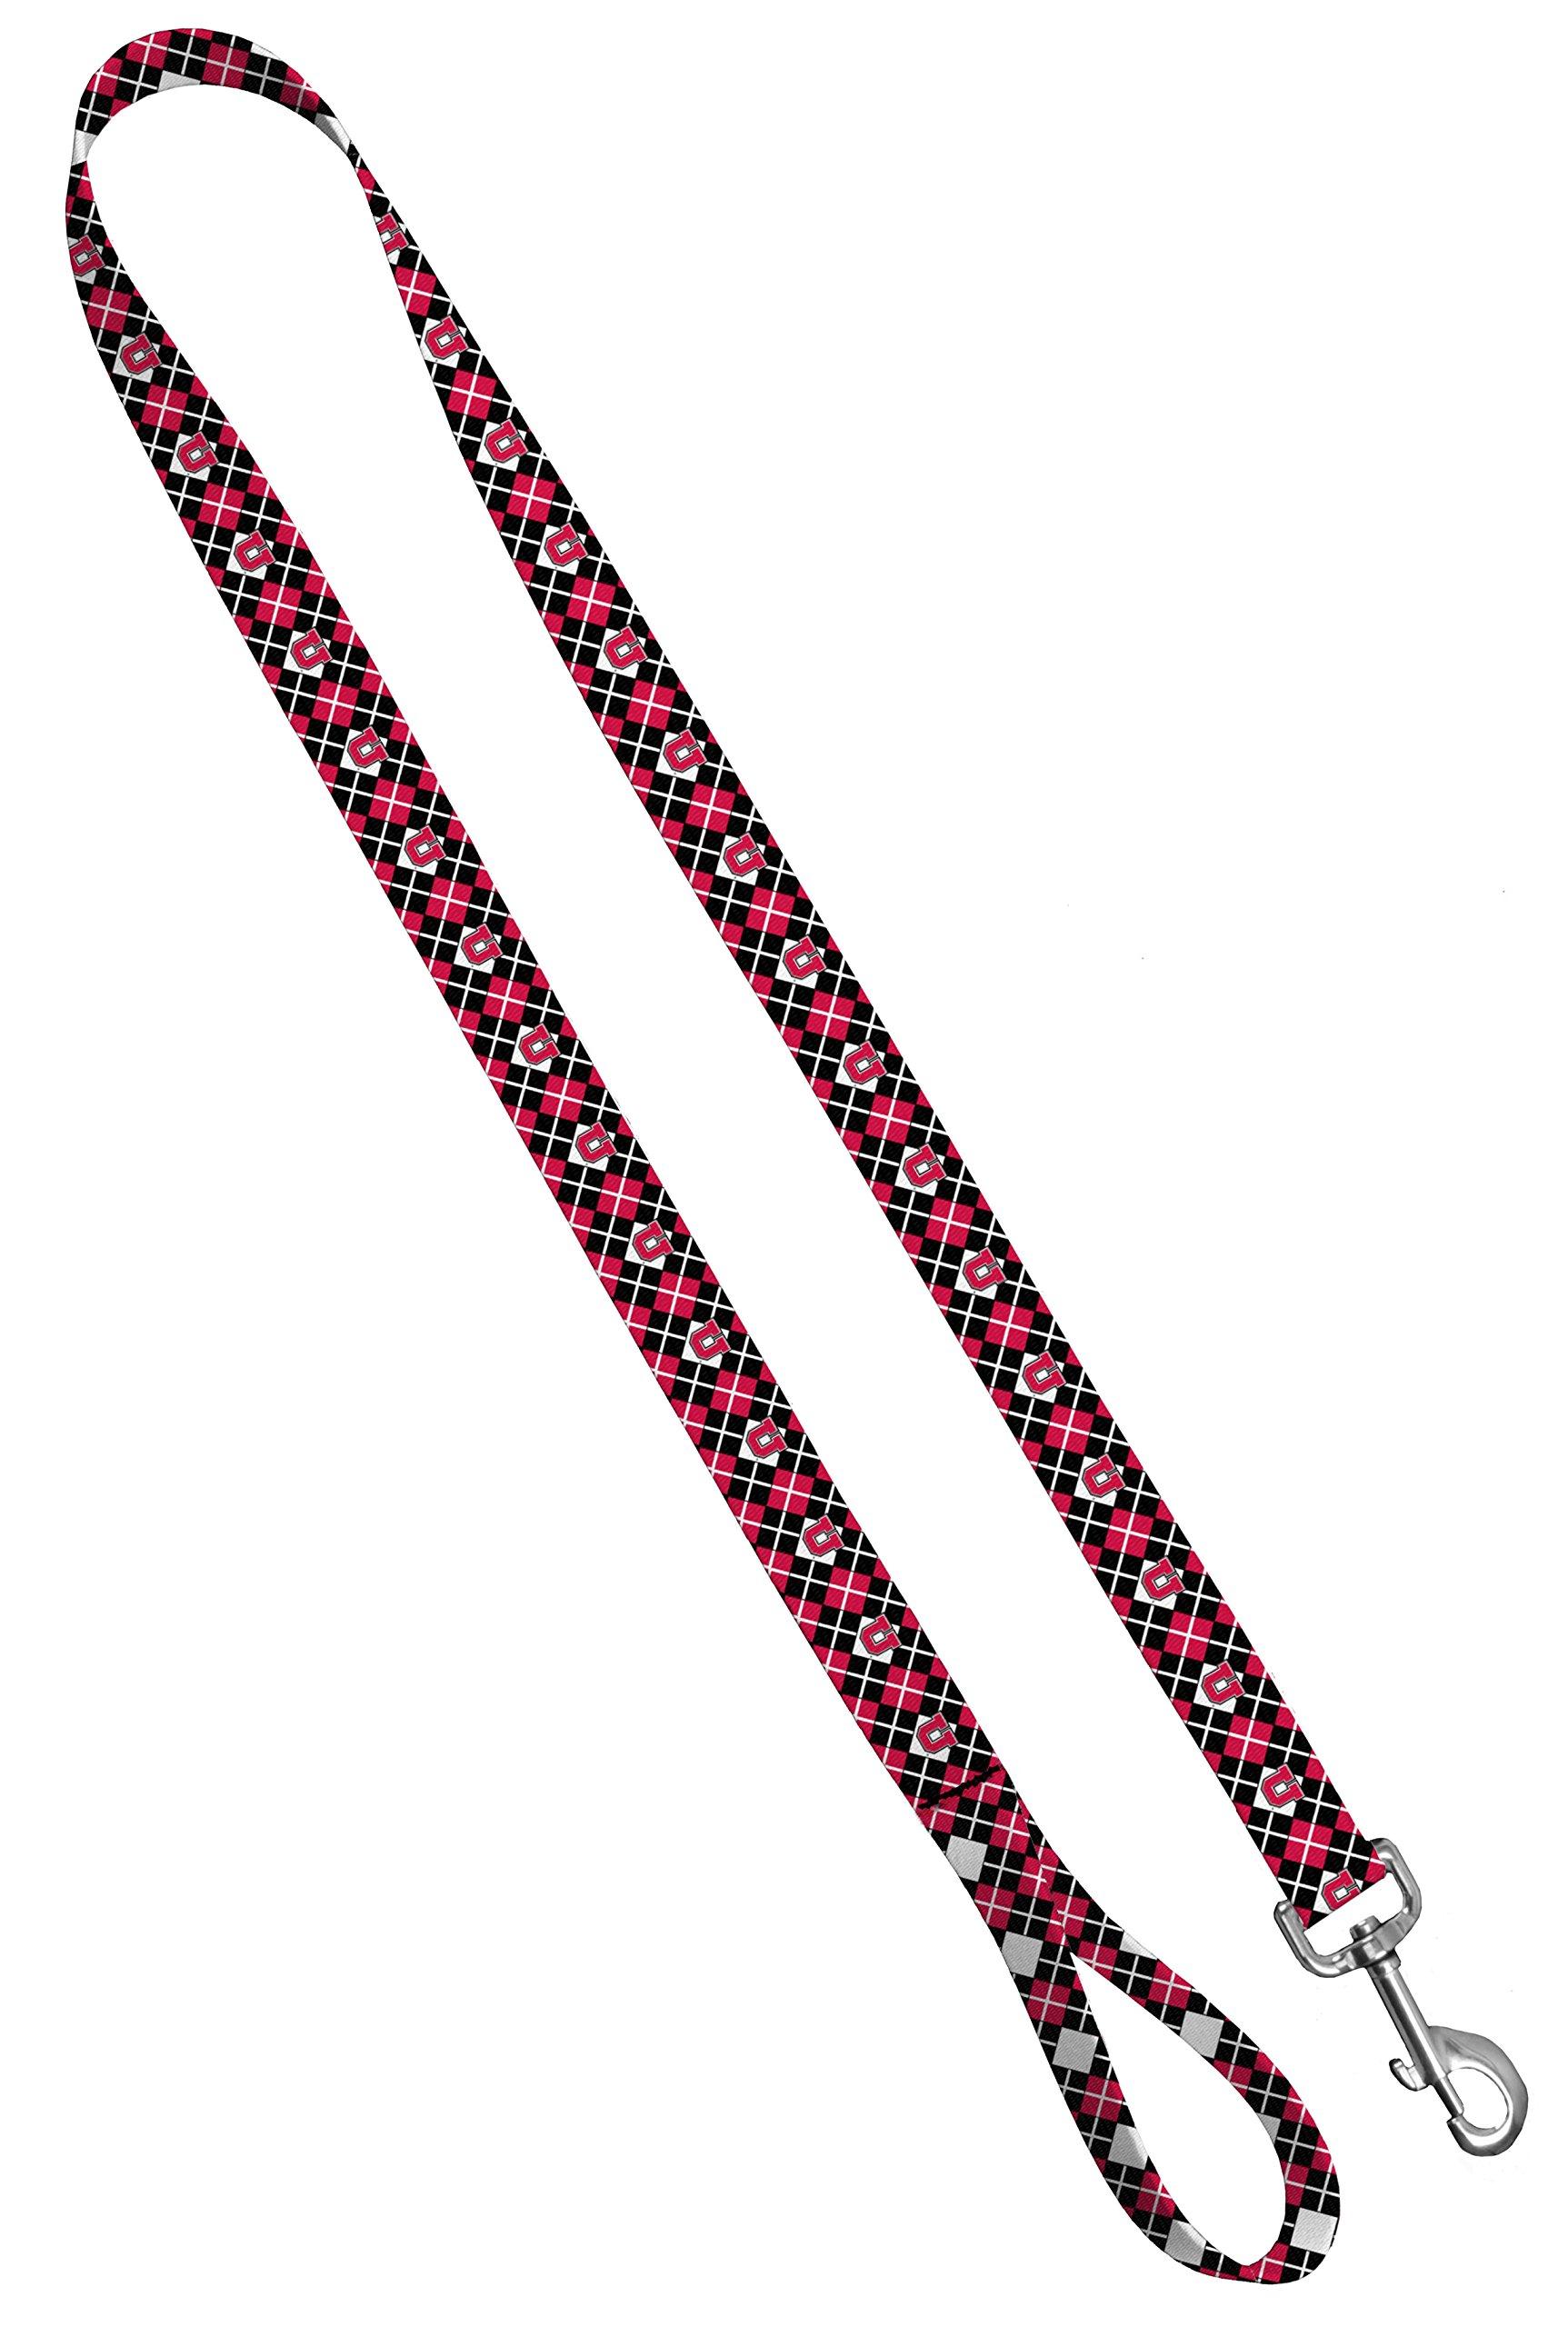 Moose Pet Wear Dog Leash – University Utah Utes Pet Leash, Made in the USA – 3/4 Inch Wide x 6 Feet Long, Argyle